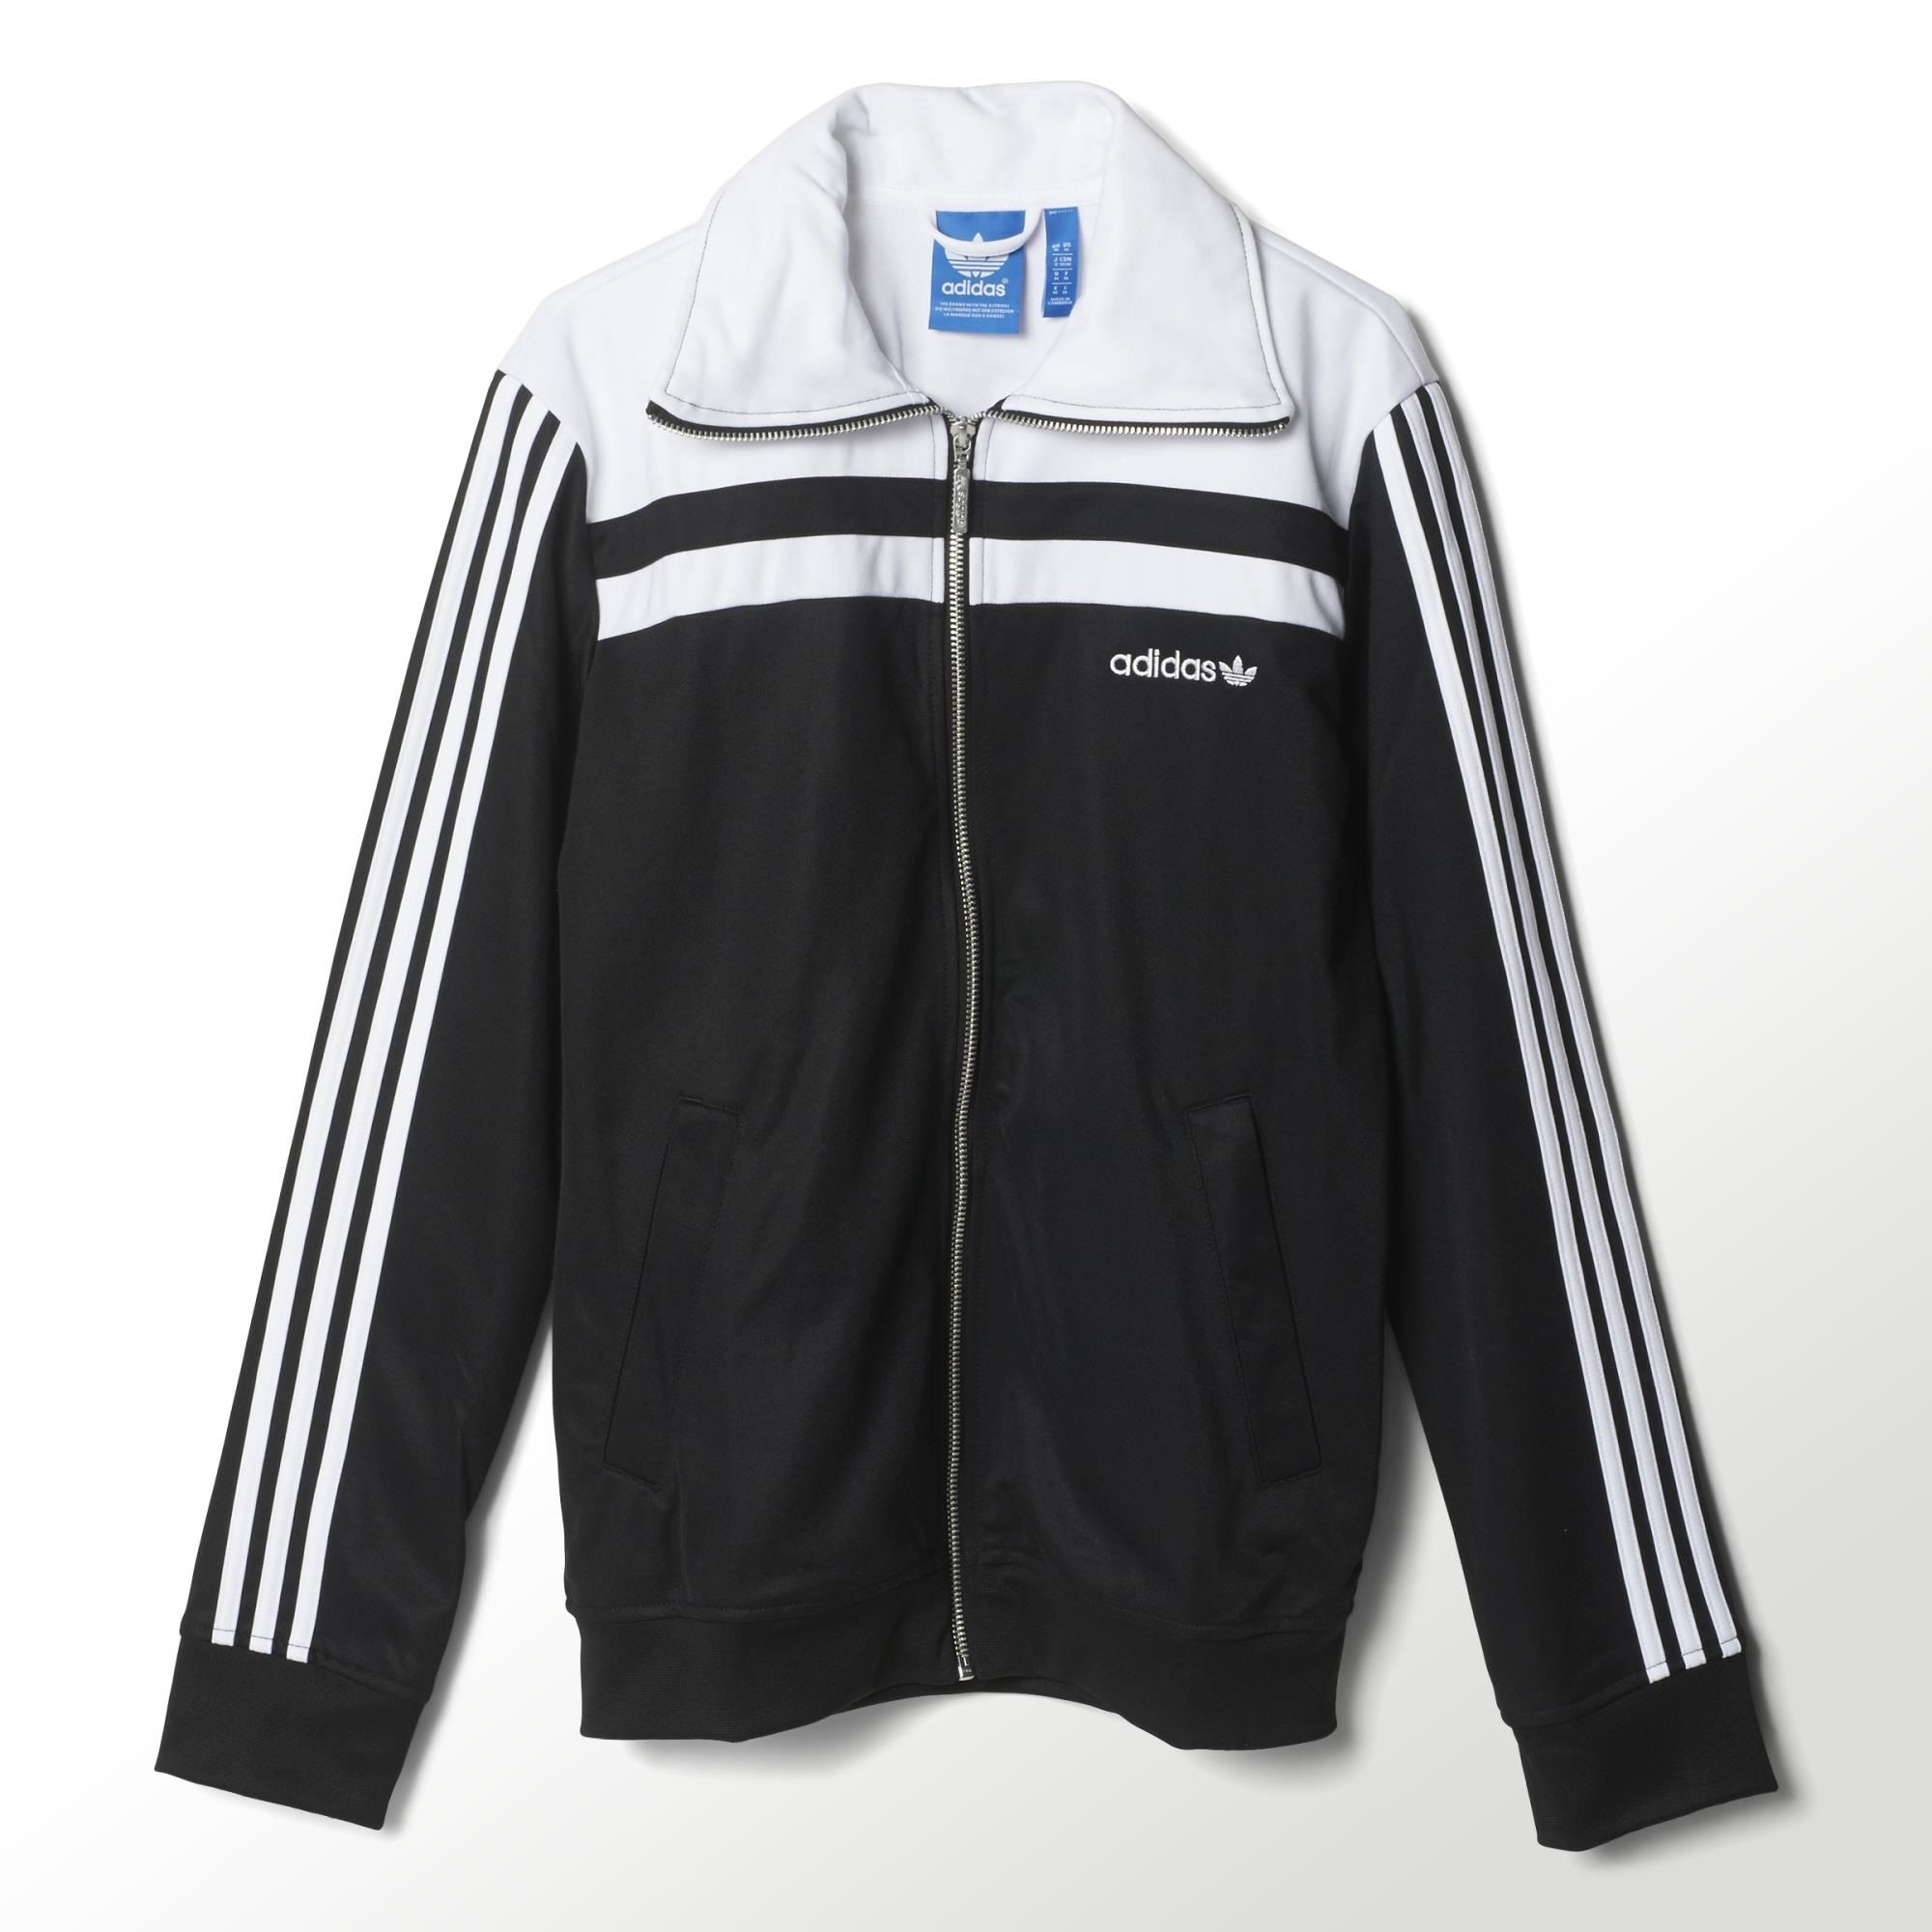 Adidas Originals Chaqueta Europa 83 Track Top (negroblanco)